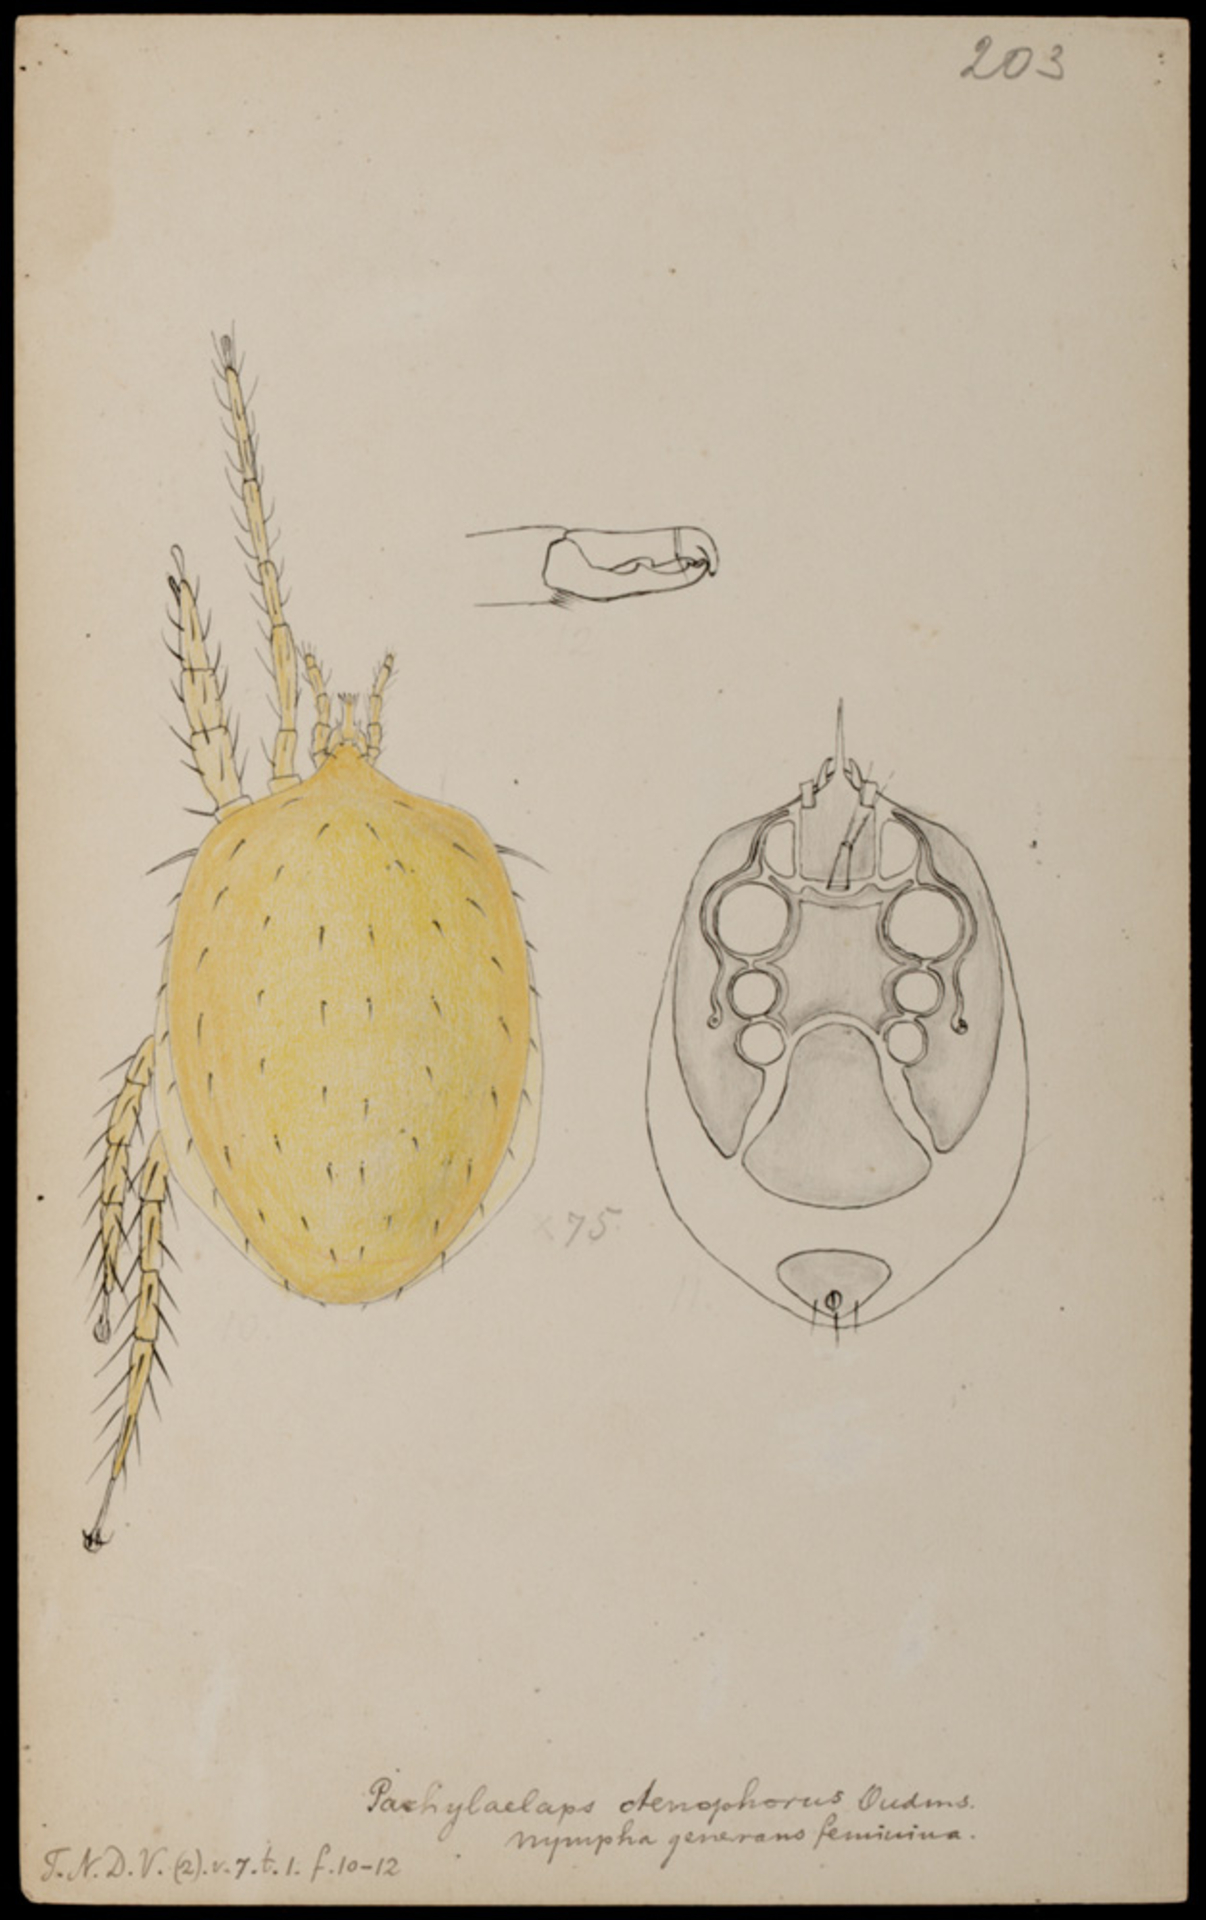 RMNH.ART.1049   Pachylaelaps ctenophorus (Oudemans)